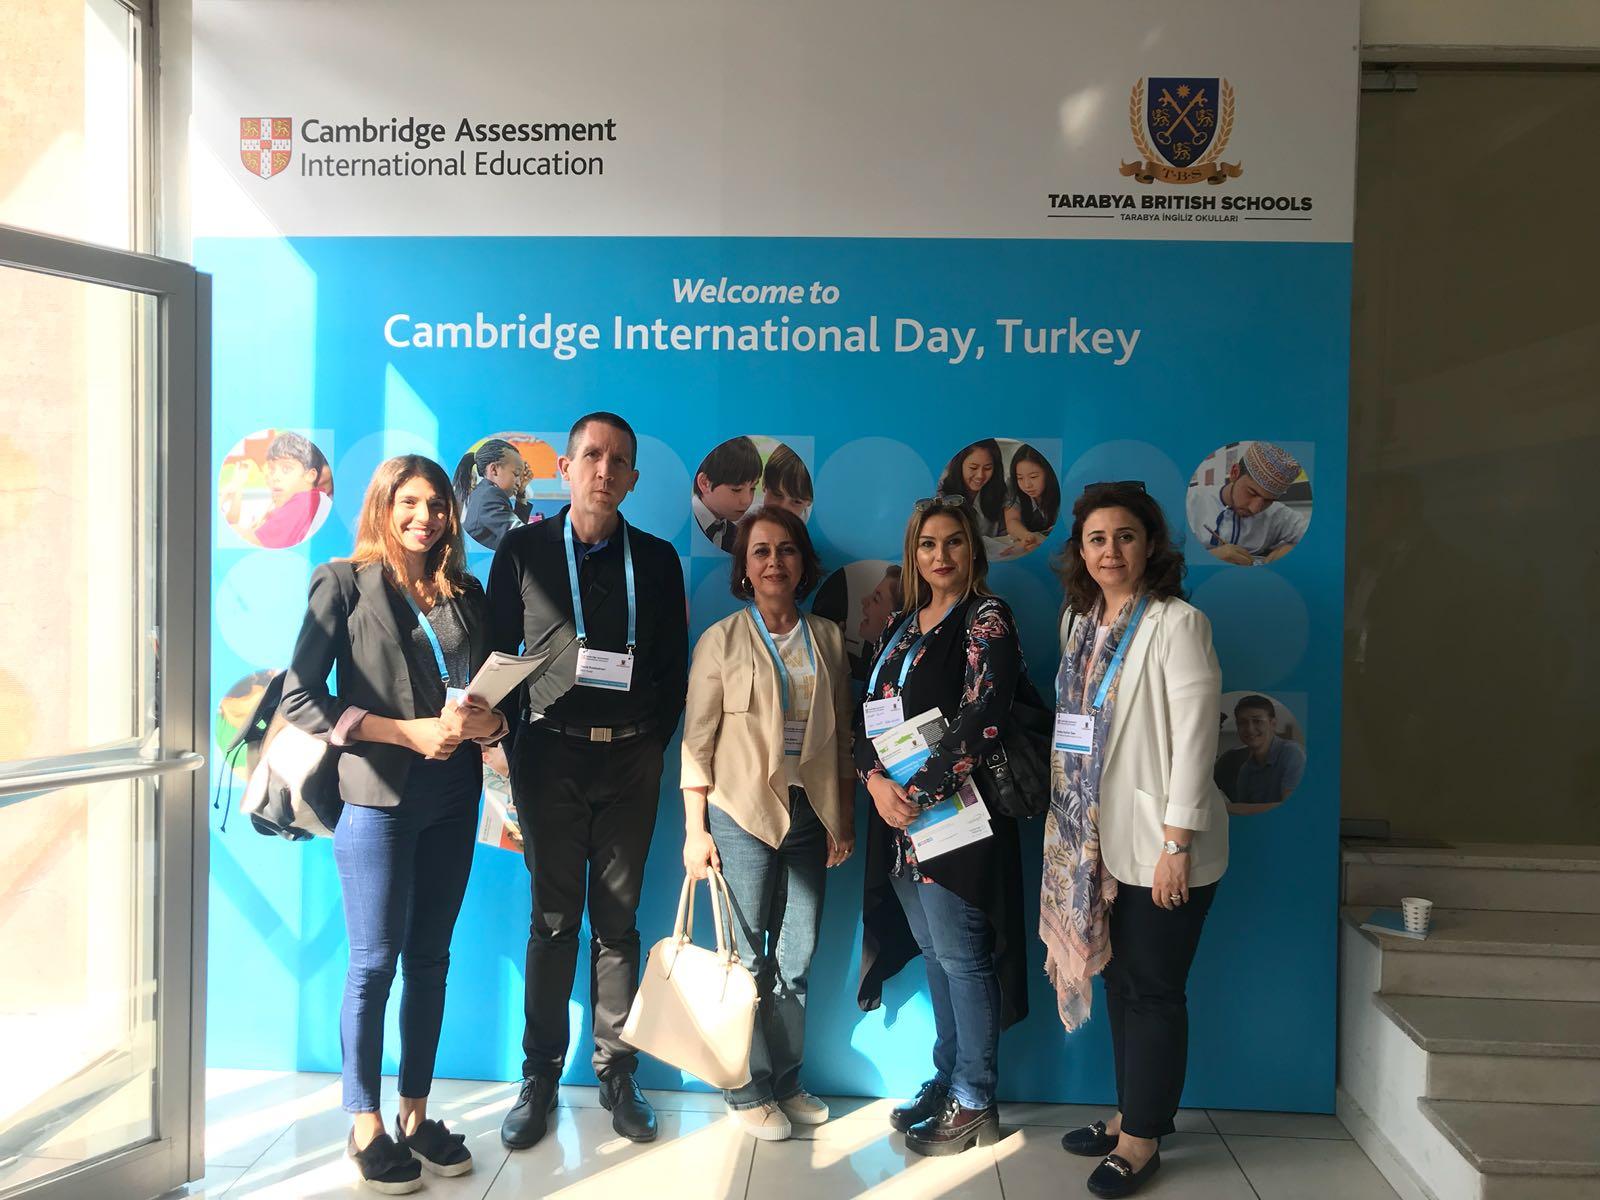 Cambridge International Day